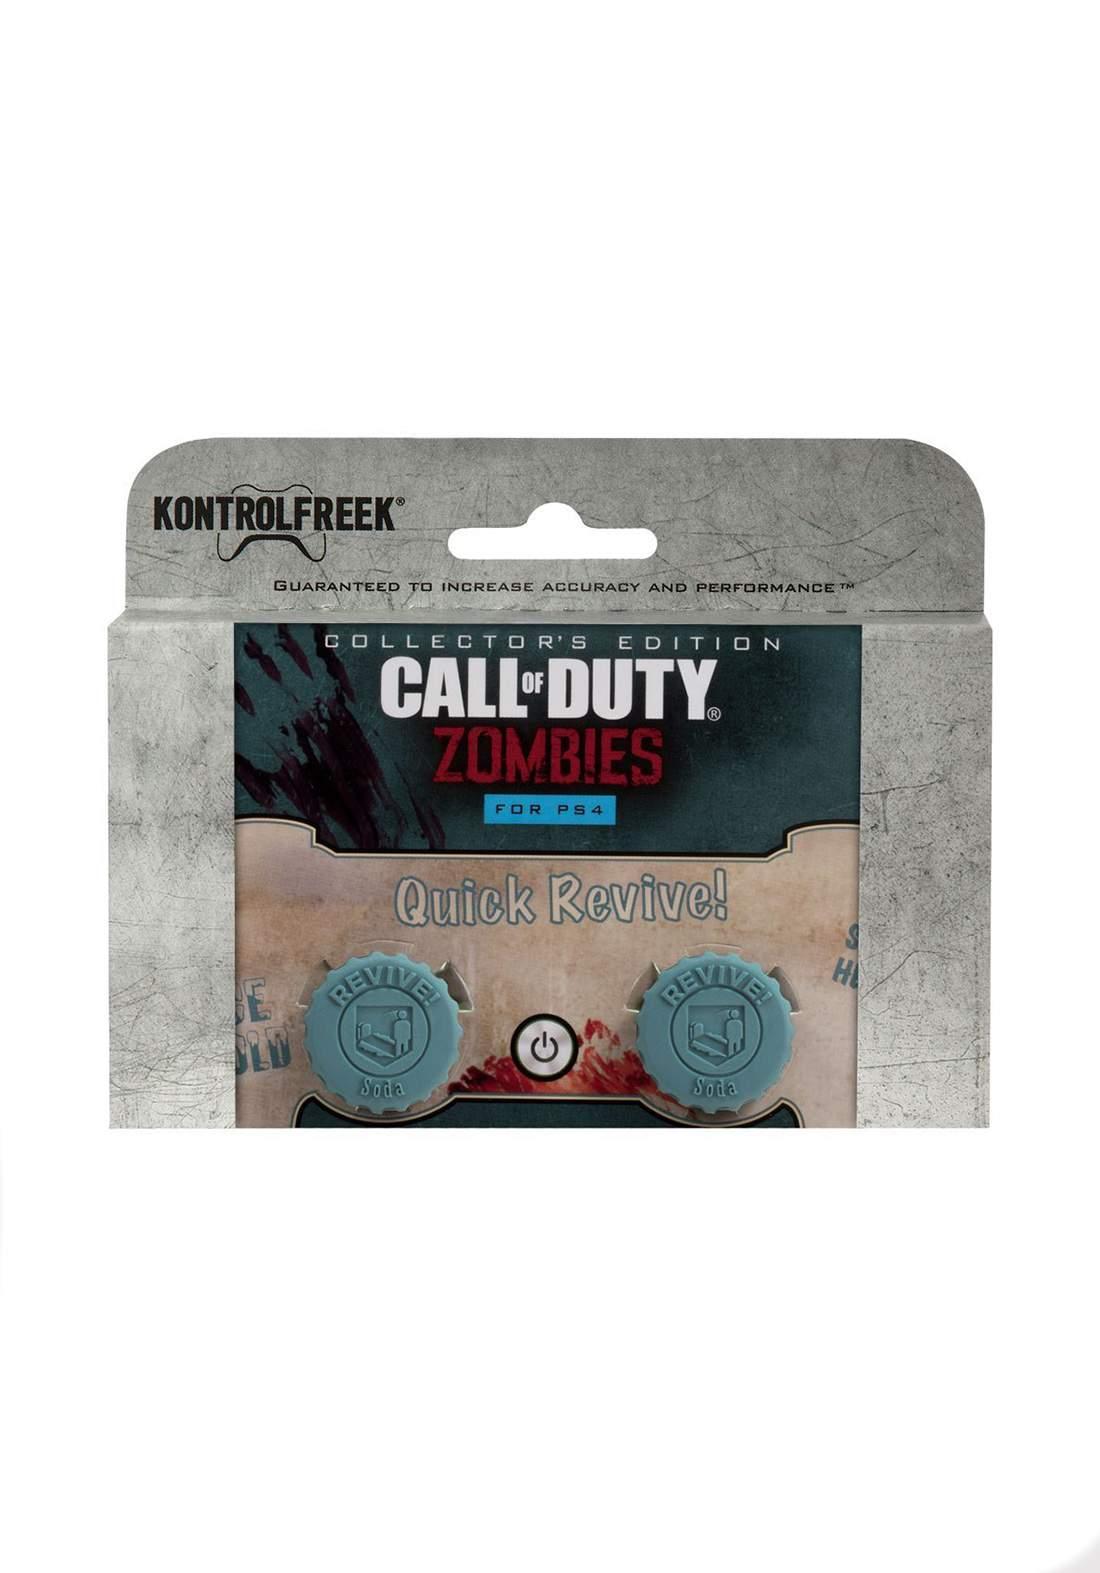 Kontrol Freek (PS4) Original Call Of Duty Zombies Juggernog Thumbsticks - Blue